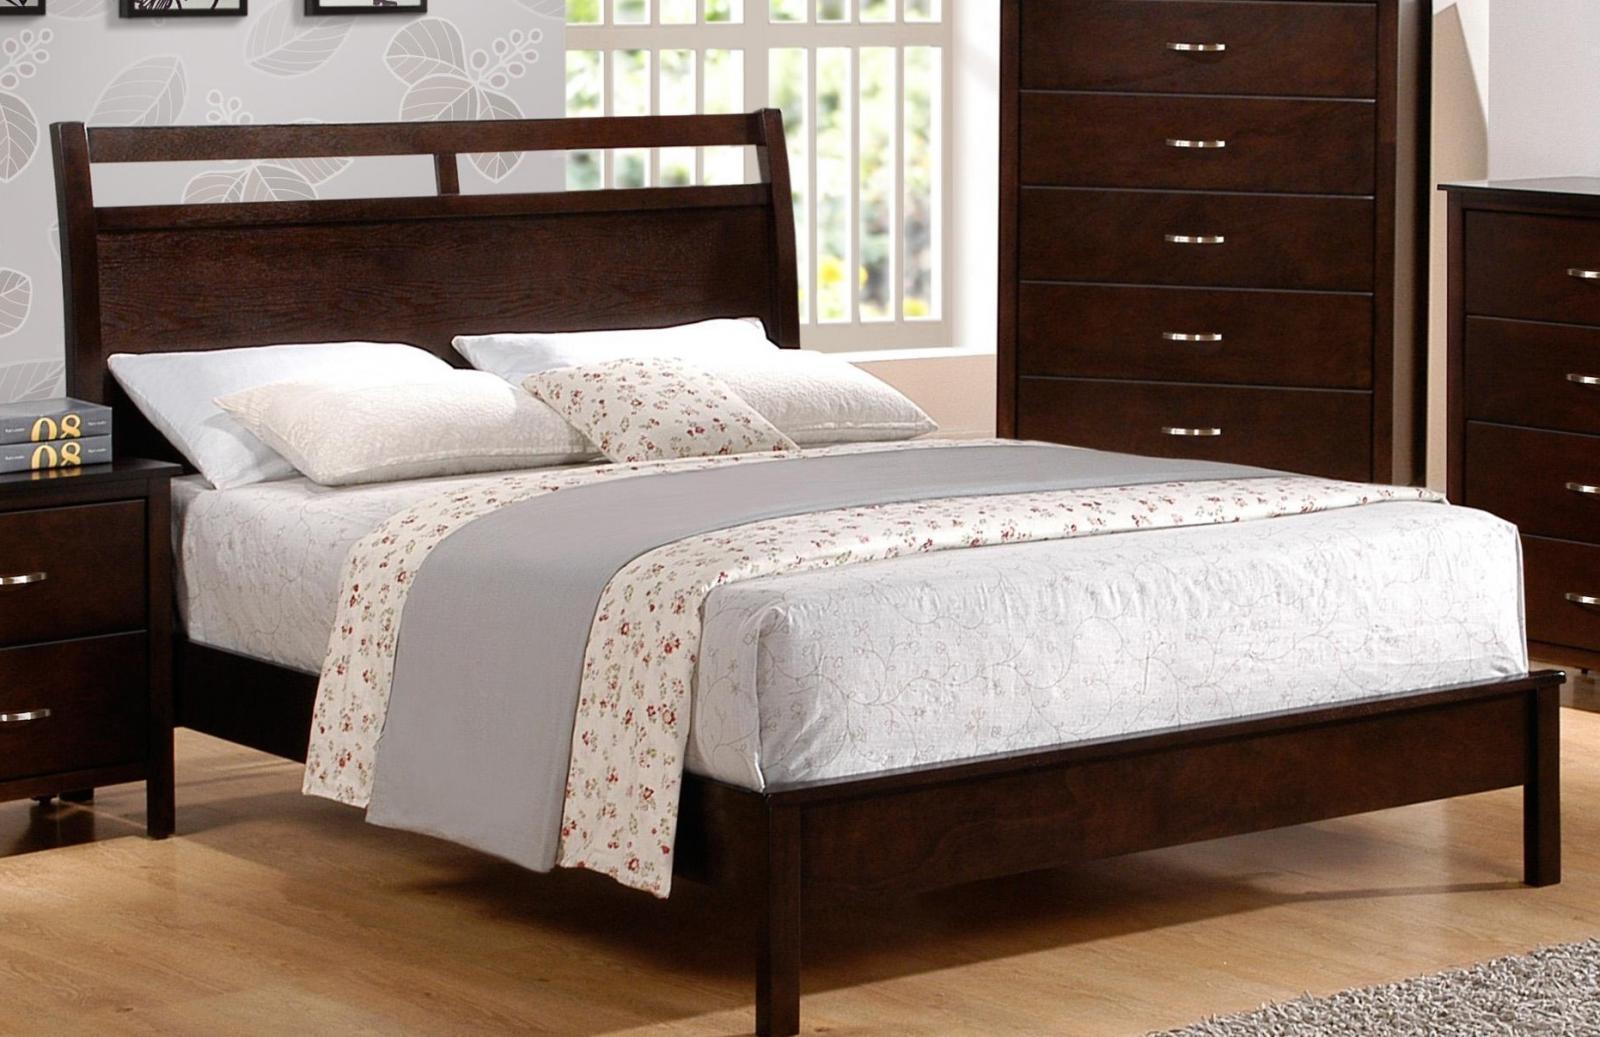 brown finish solid wood queen size bedroom set 5pcs crown mark b7300 7350 1ian bedroom sets. Black Bedroom Furniture Sets. Home Design Ideas